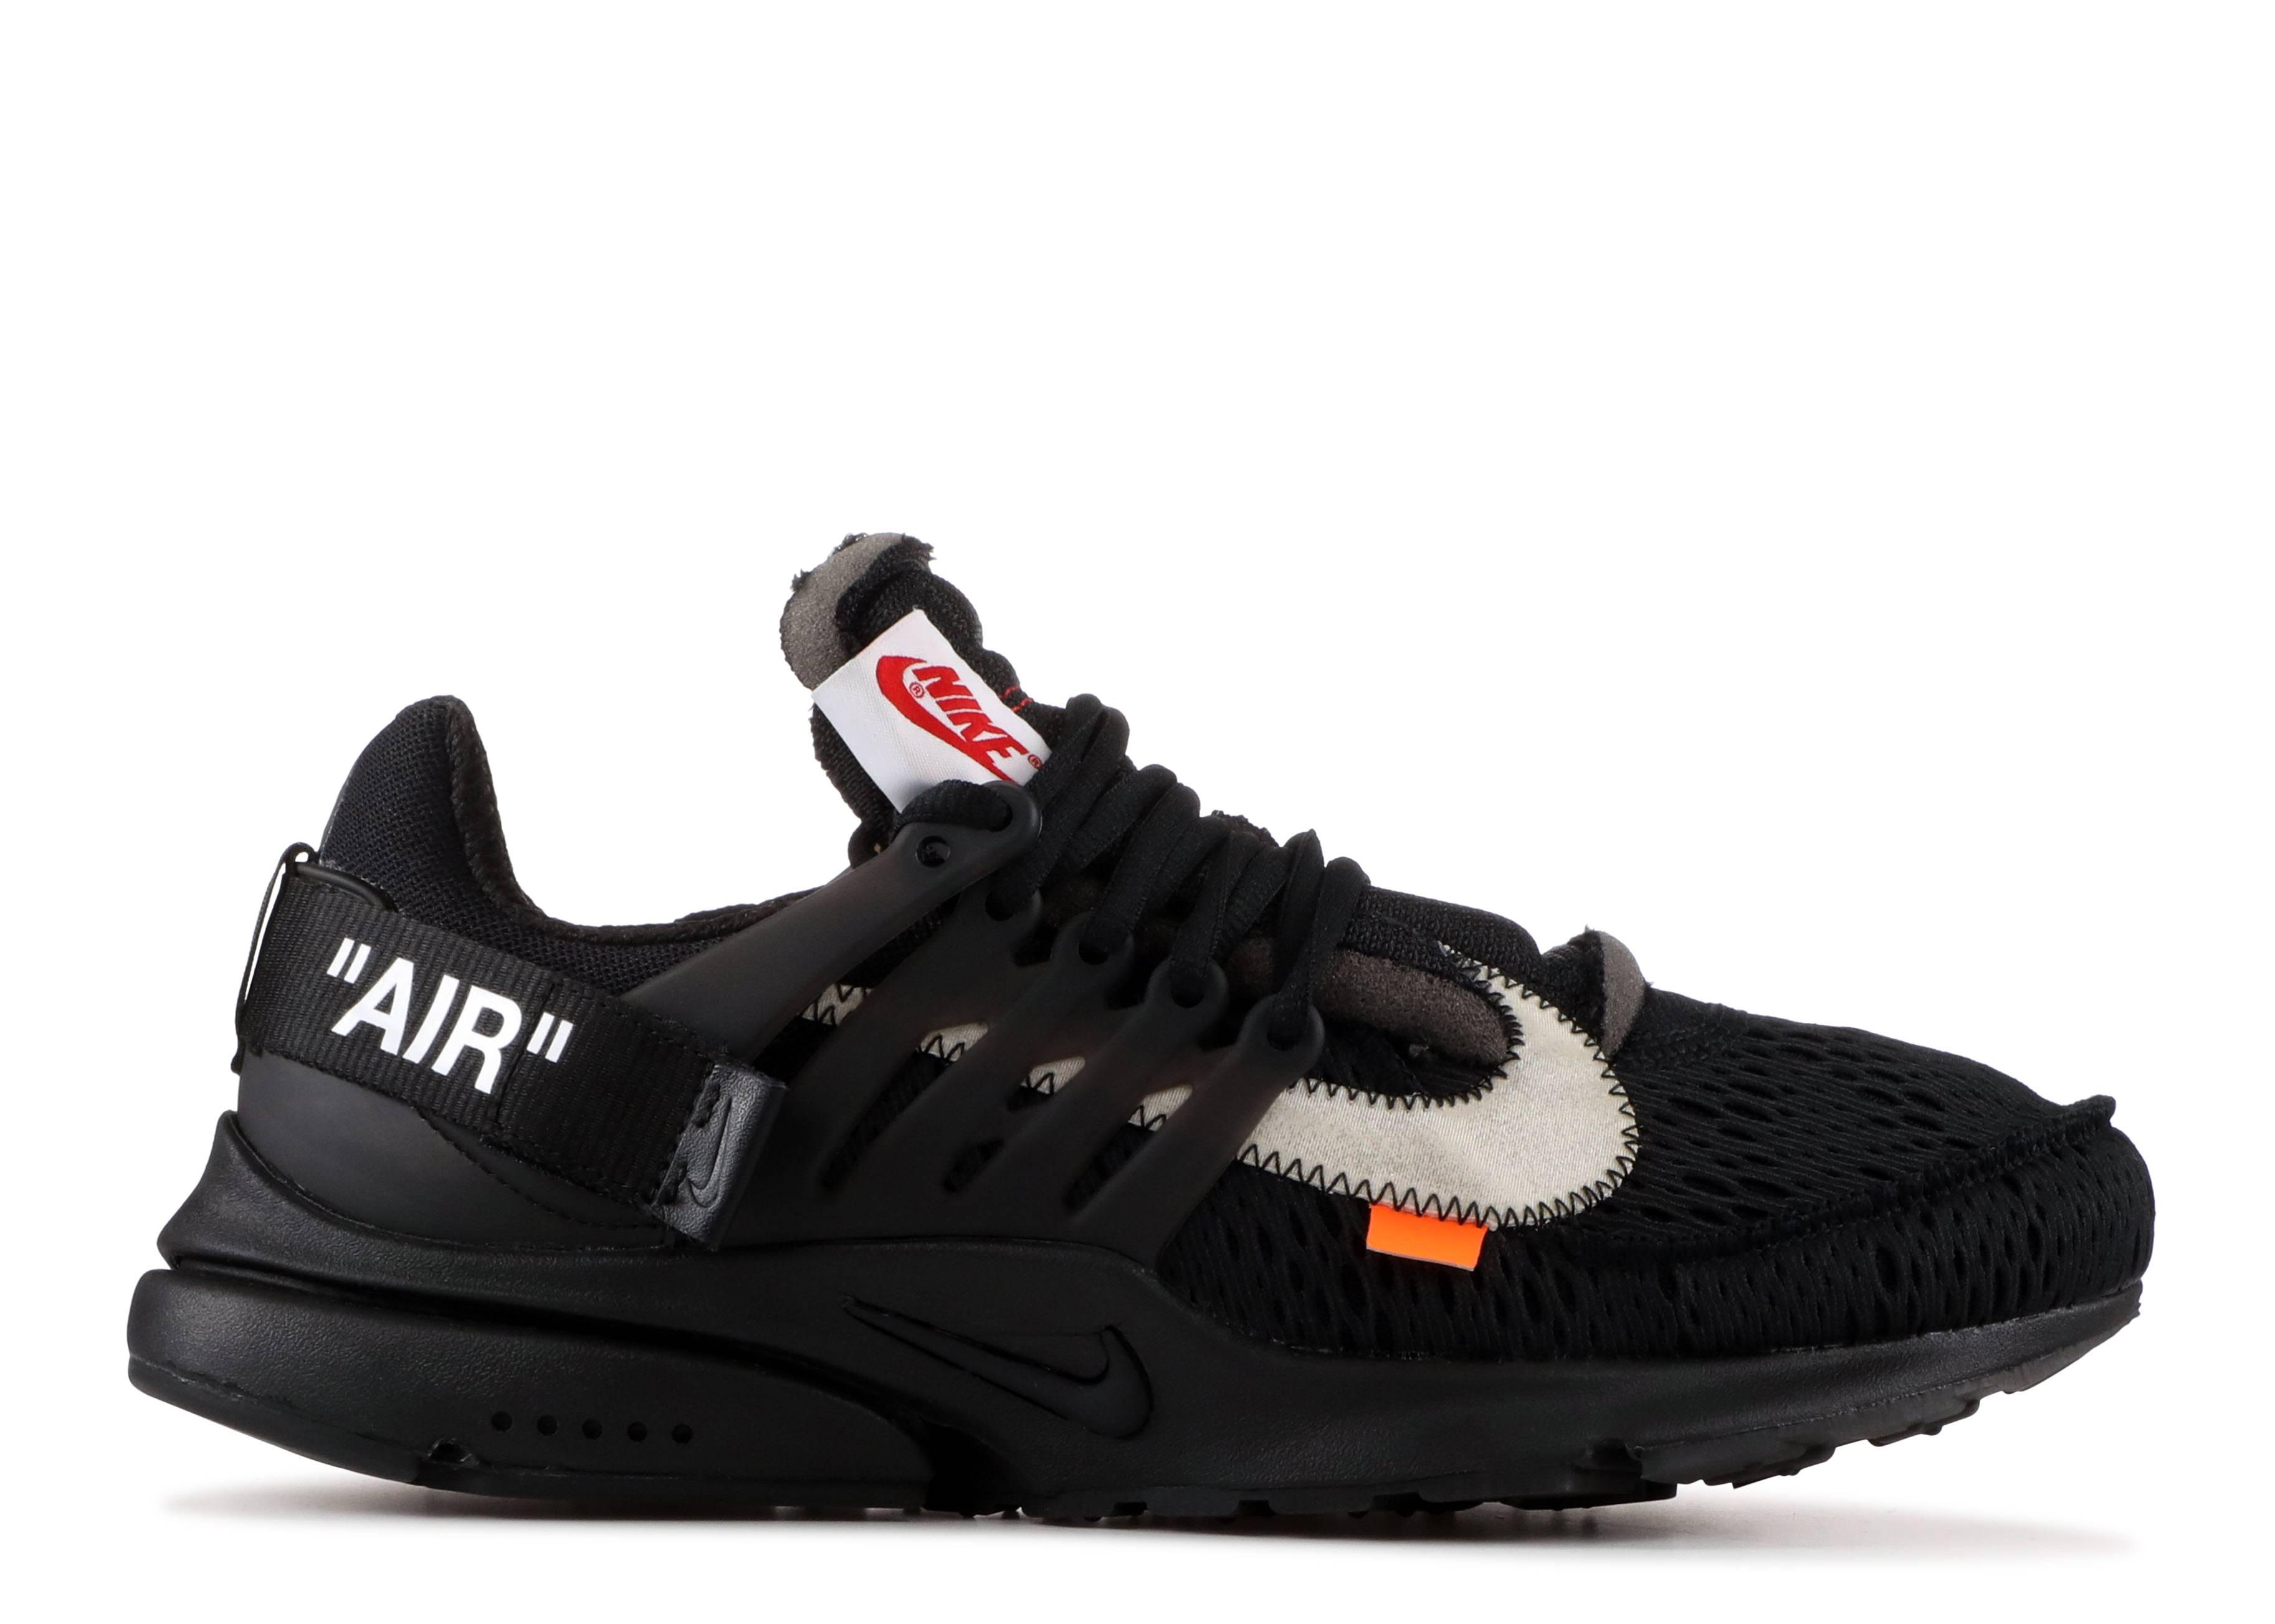 add7b81fa0 The 10: Nike Air Presto